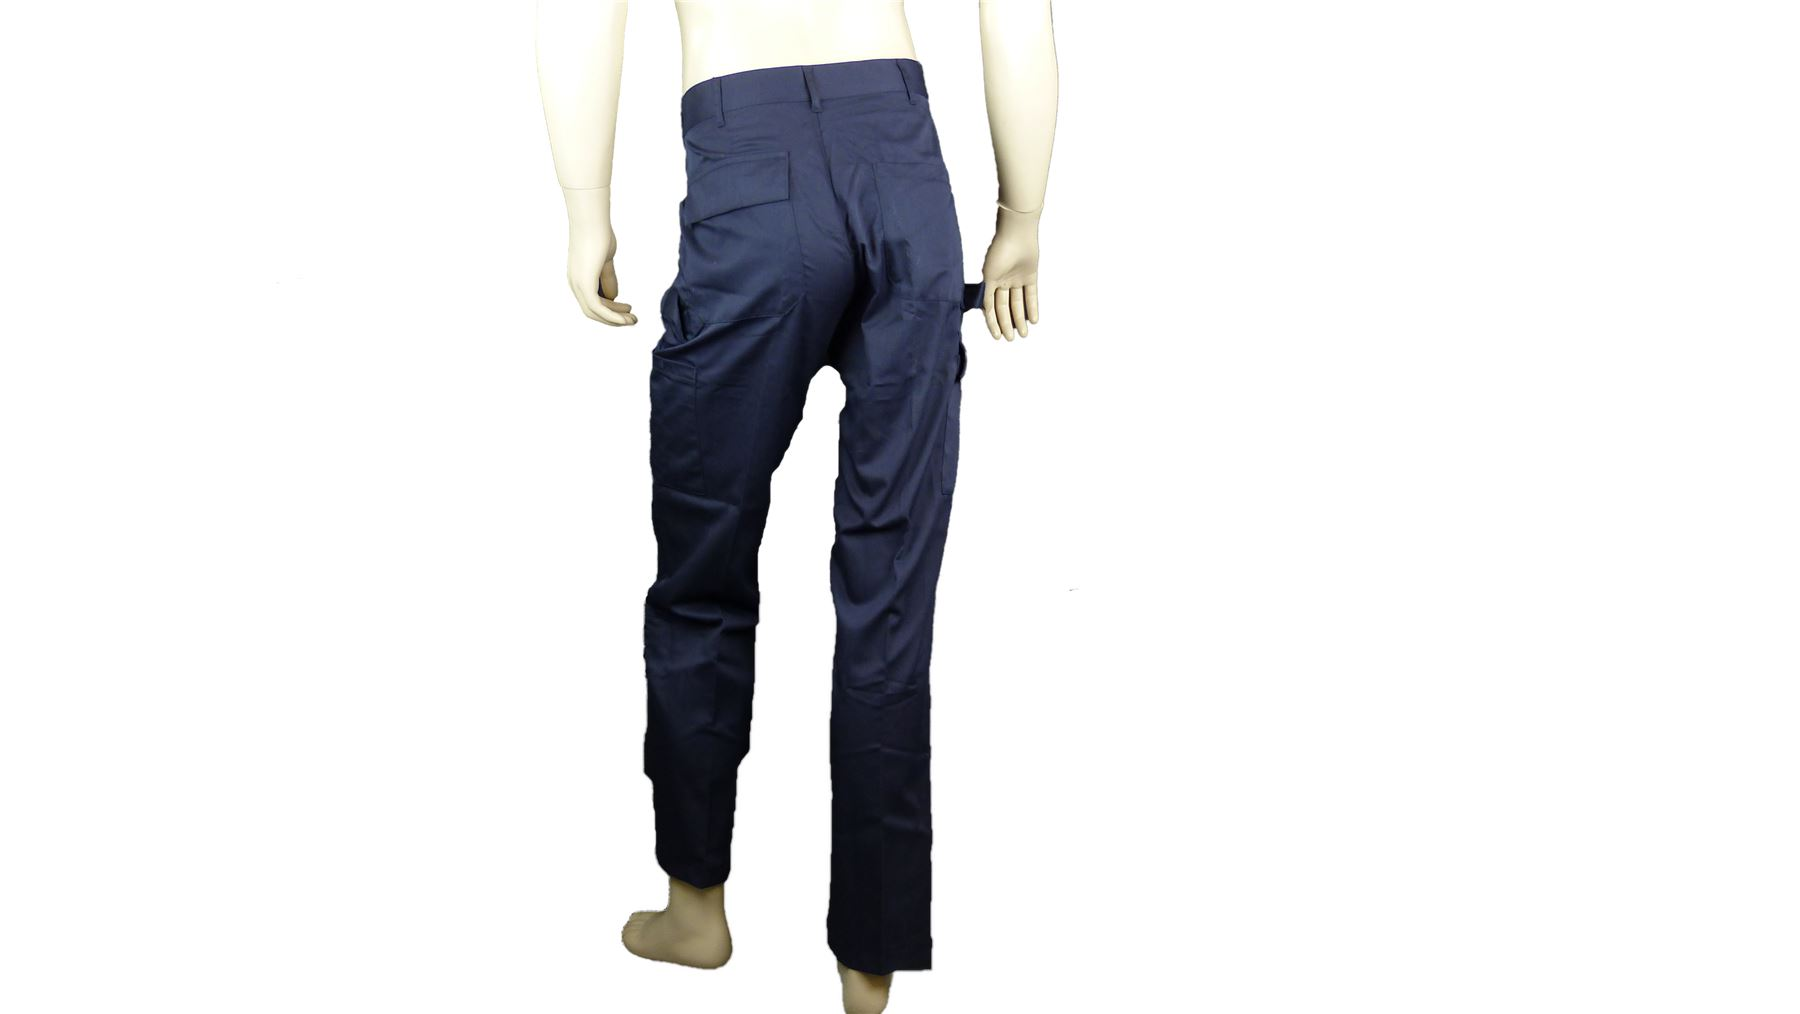 Plumb Center Workwear Trousers 32W x Leg